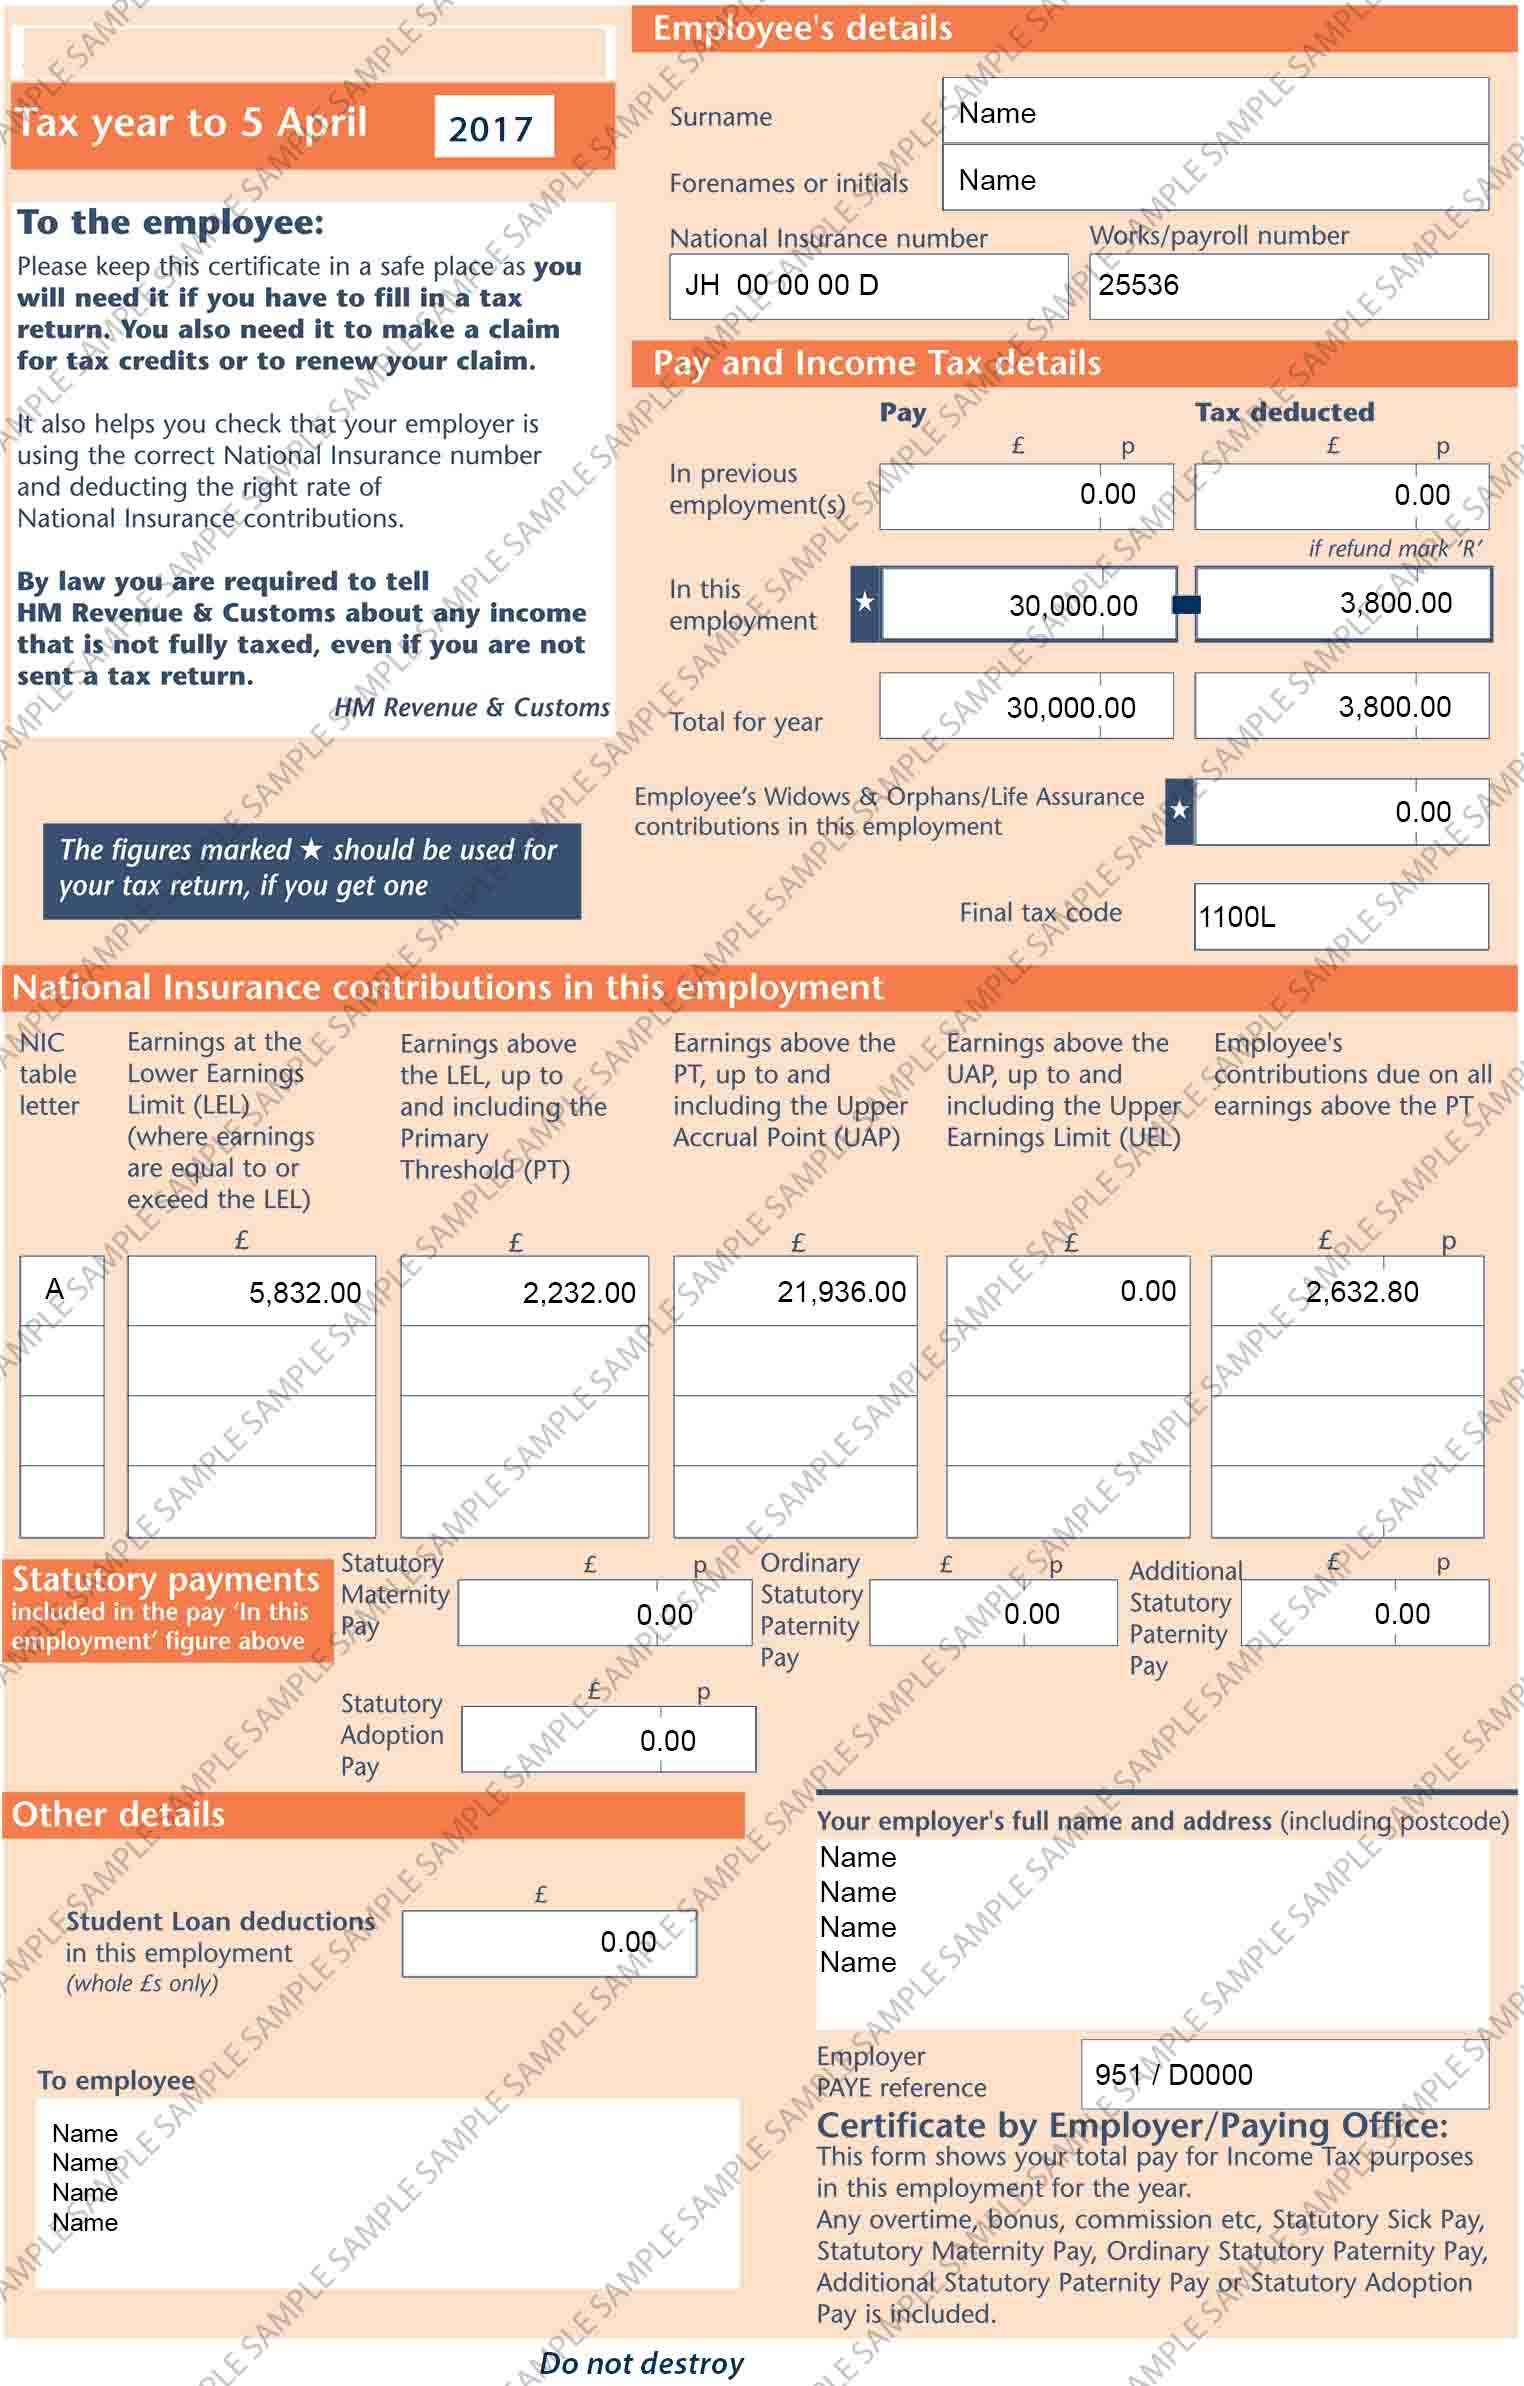 HMRC P60 Digital Copy National insurance number, Tax